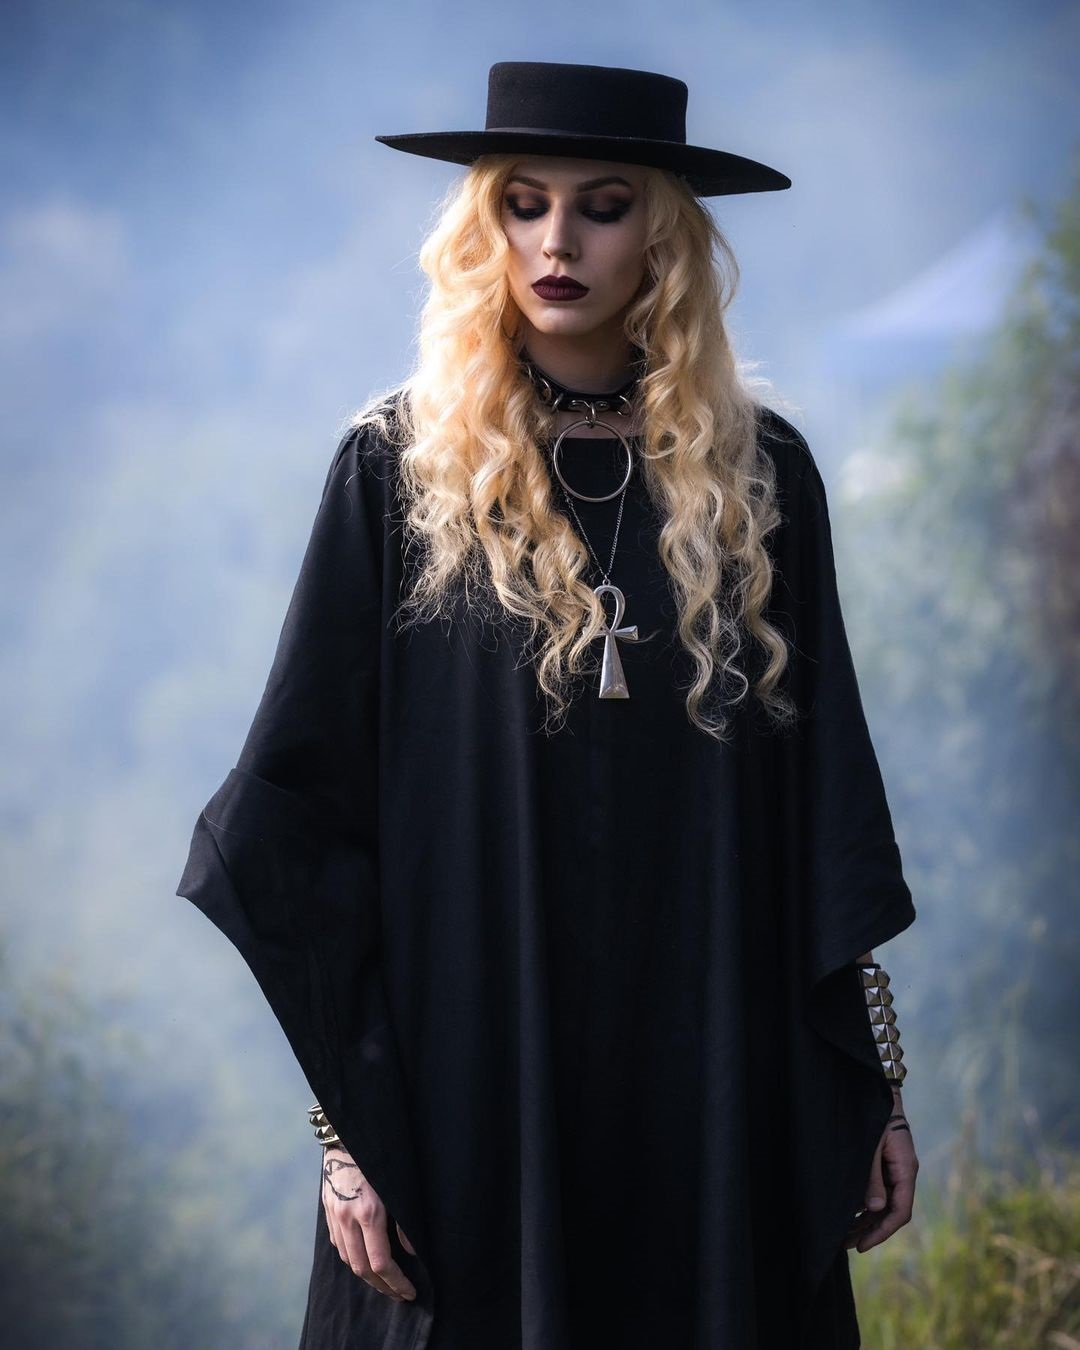 SONIA - Interviews (priestess)